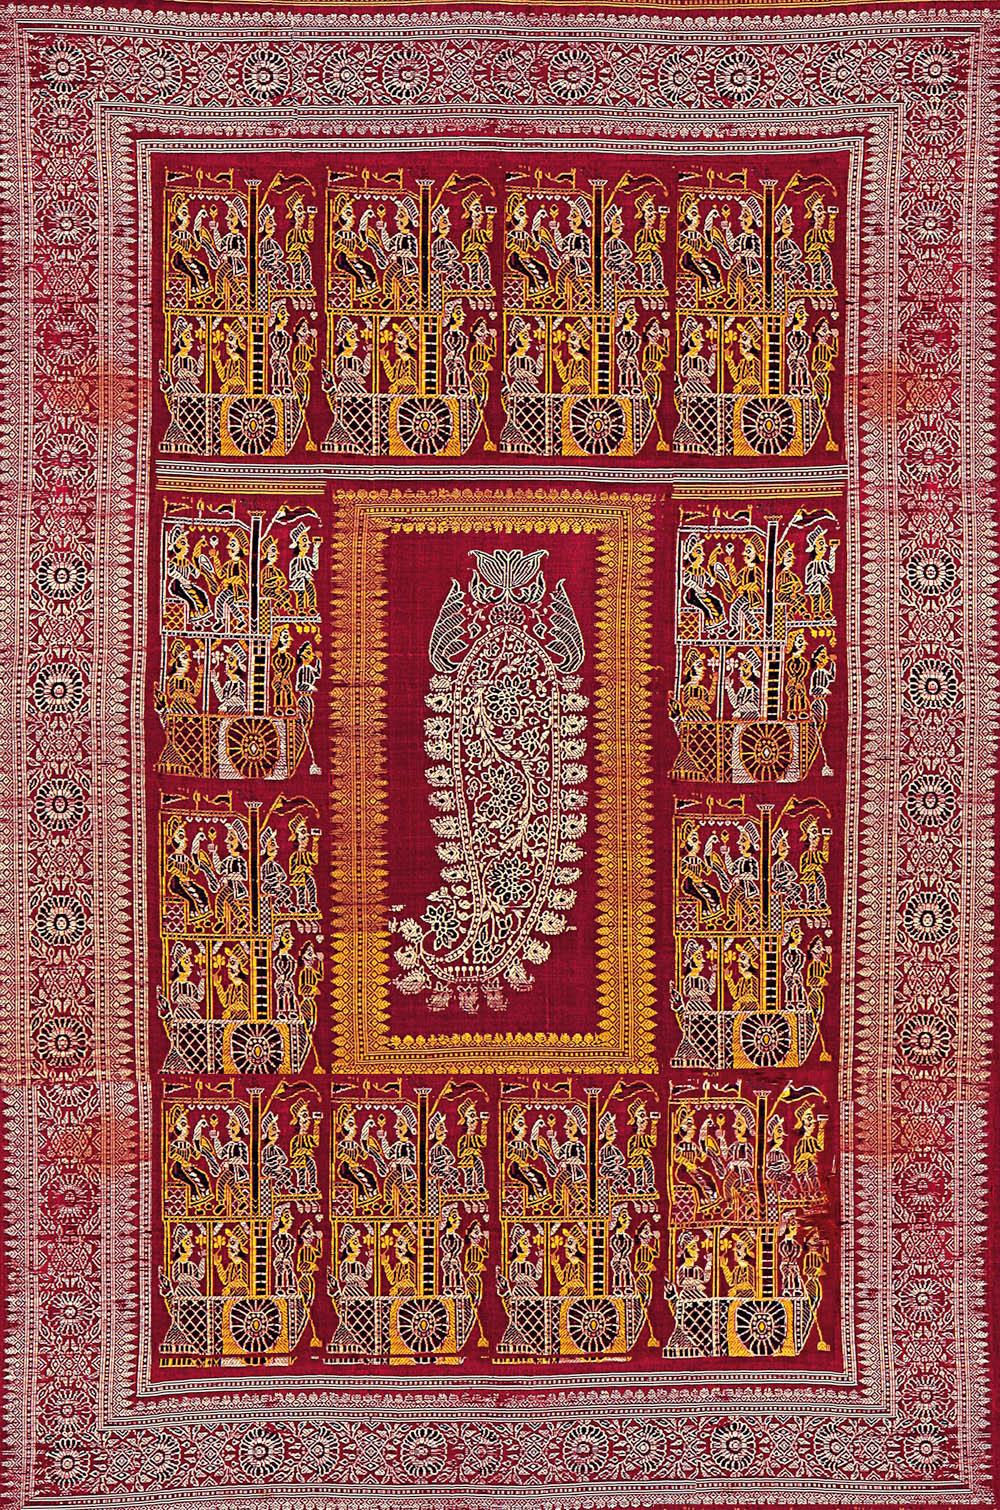 Detail of a Baluchar silk sari, west Bengal, 19th century. Tapi Collection, Surat